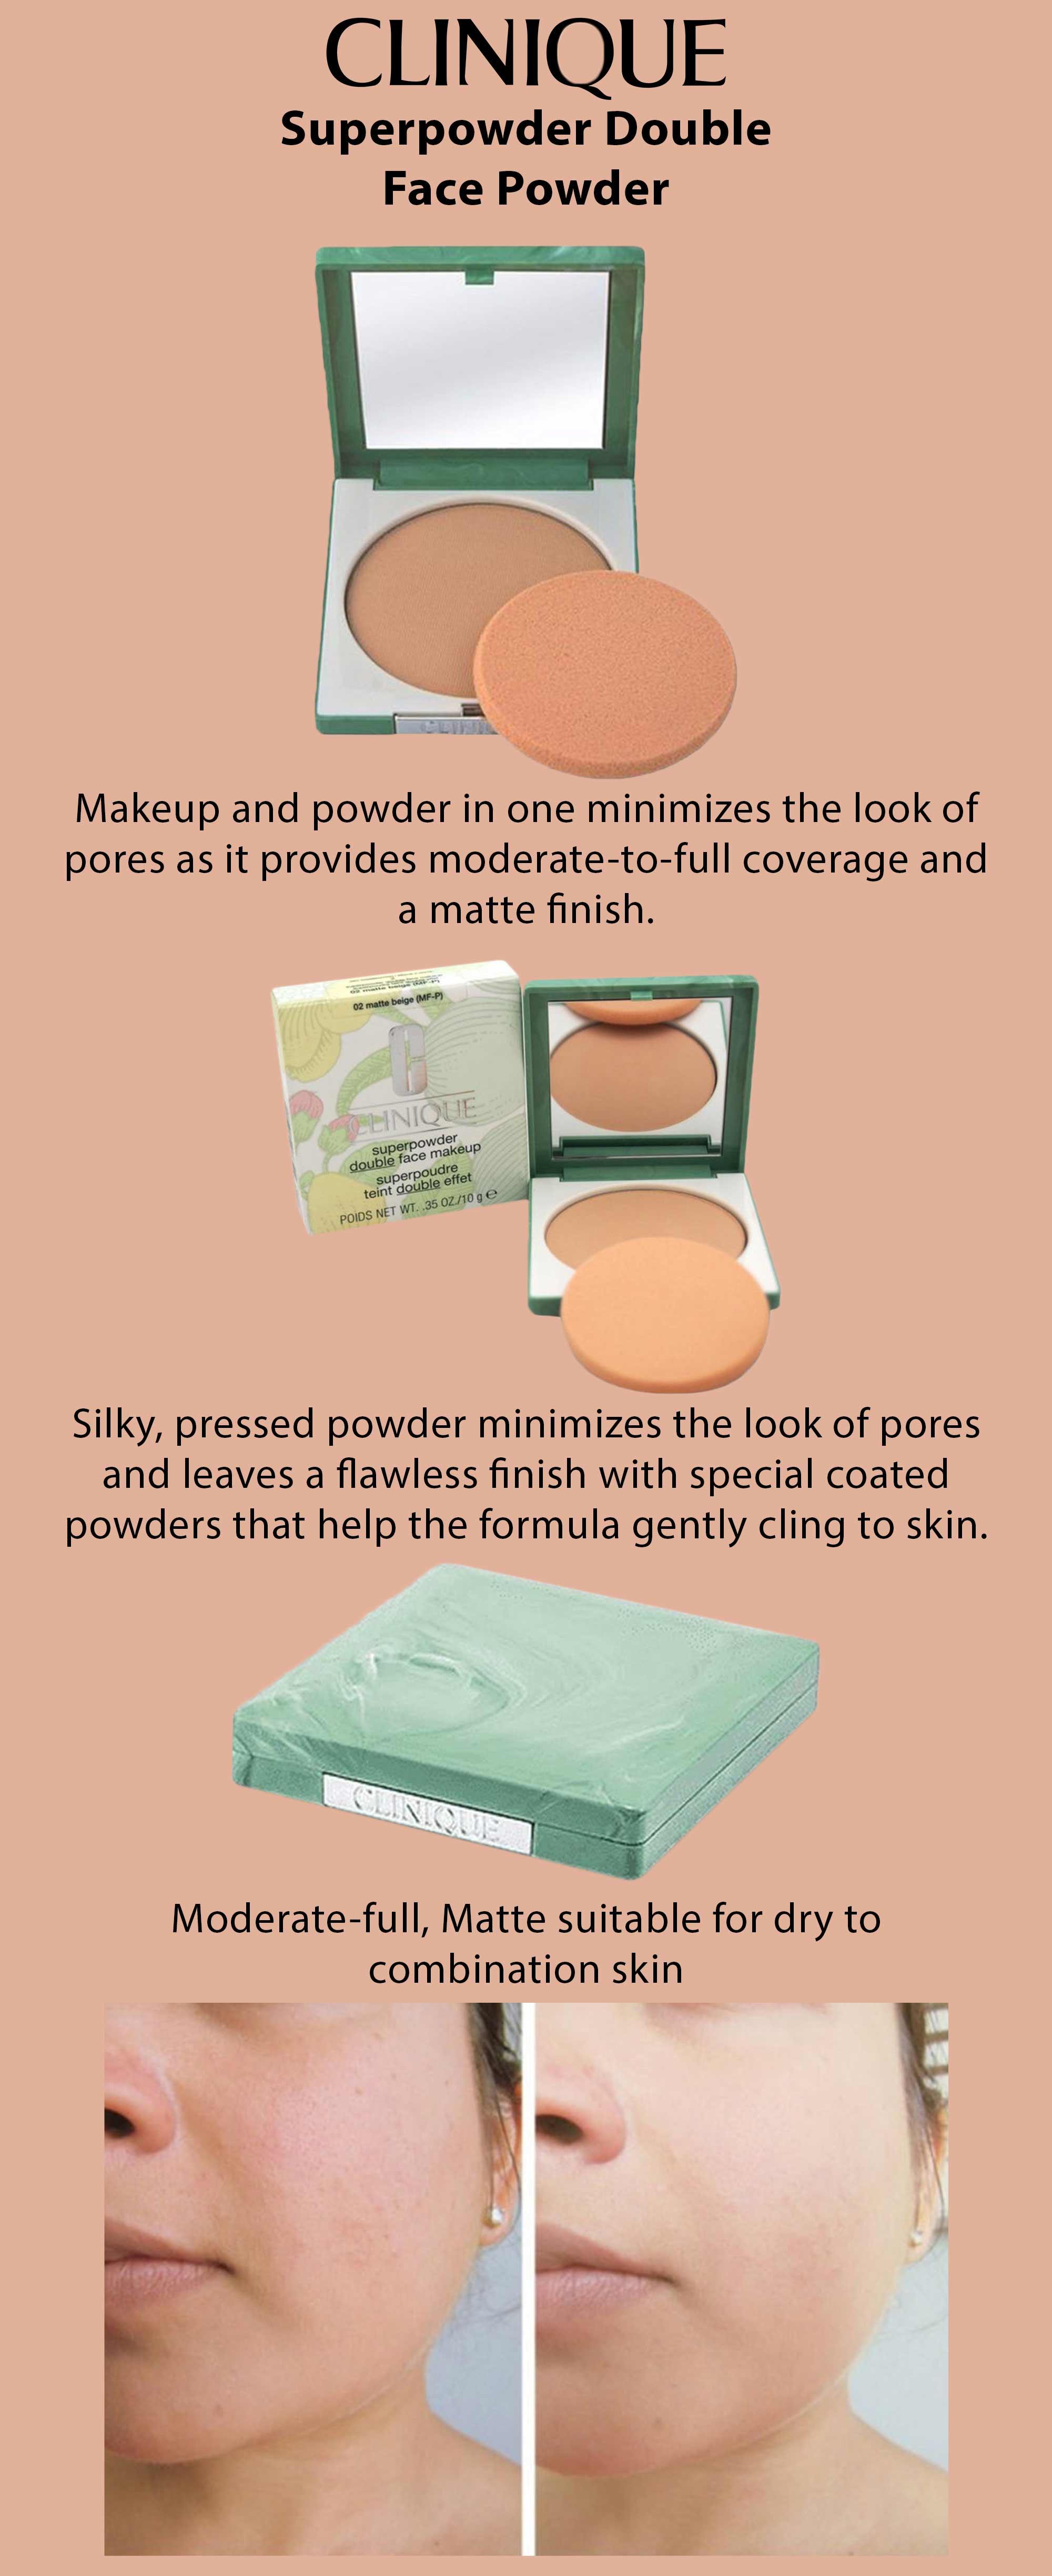 Shop Clinique Superpowder Double Face Powder Matte Beige online in Dubai,  Abu Dhabi and all UAE